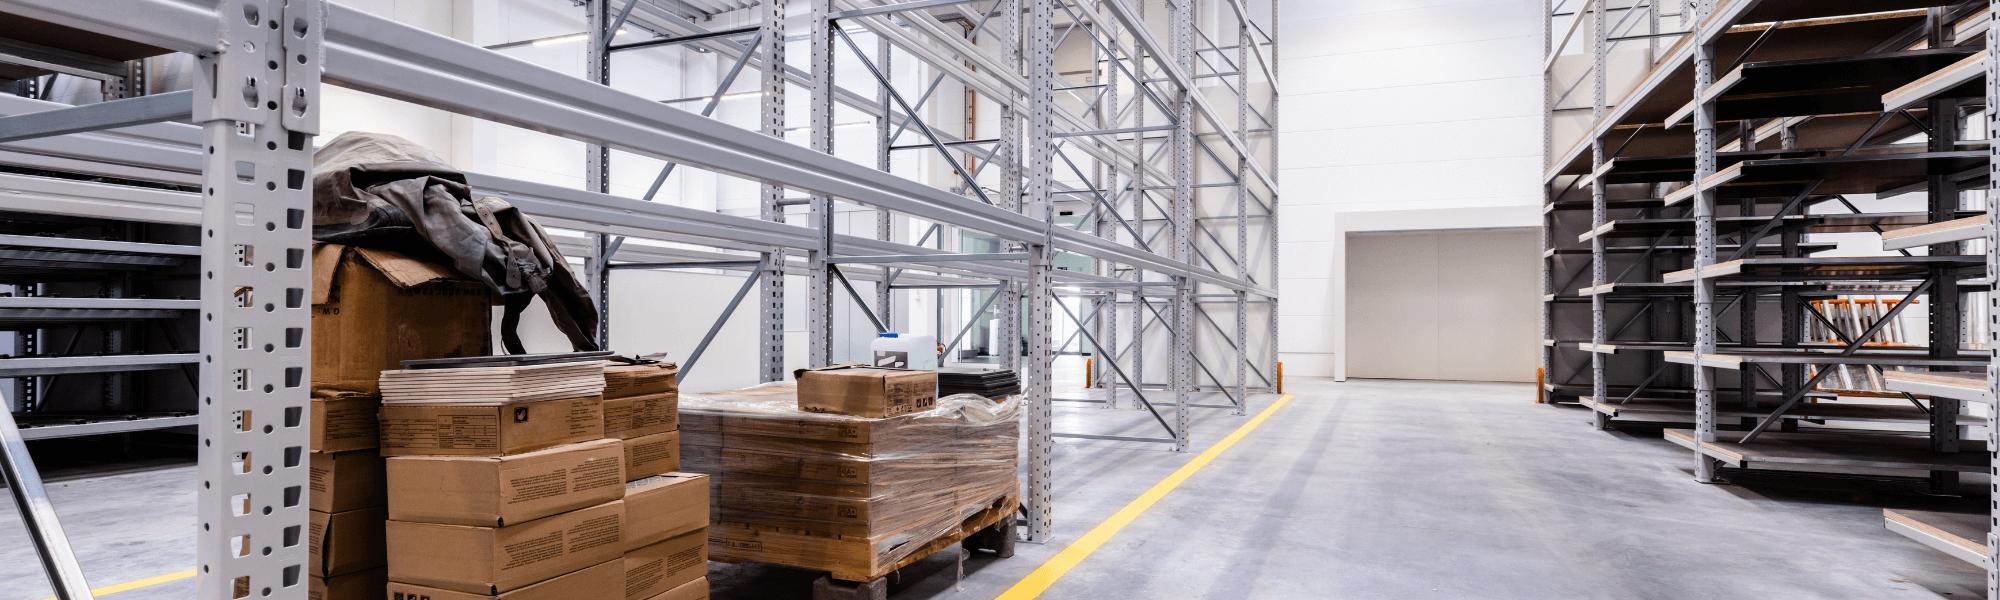 supply chain disruptions Nowsight BI